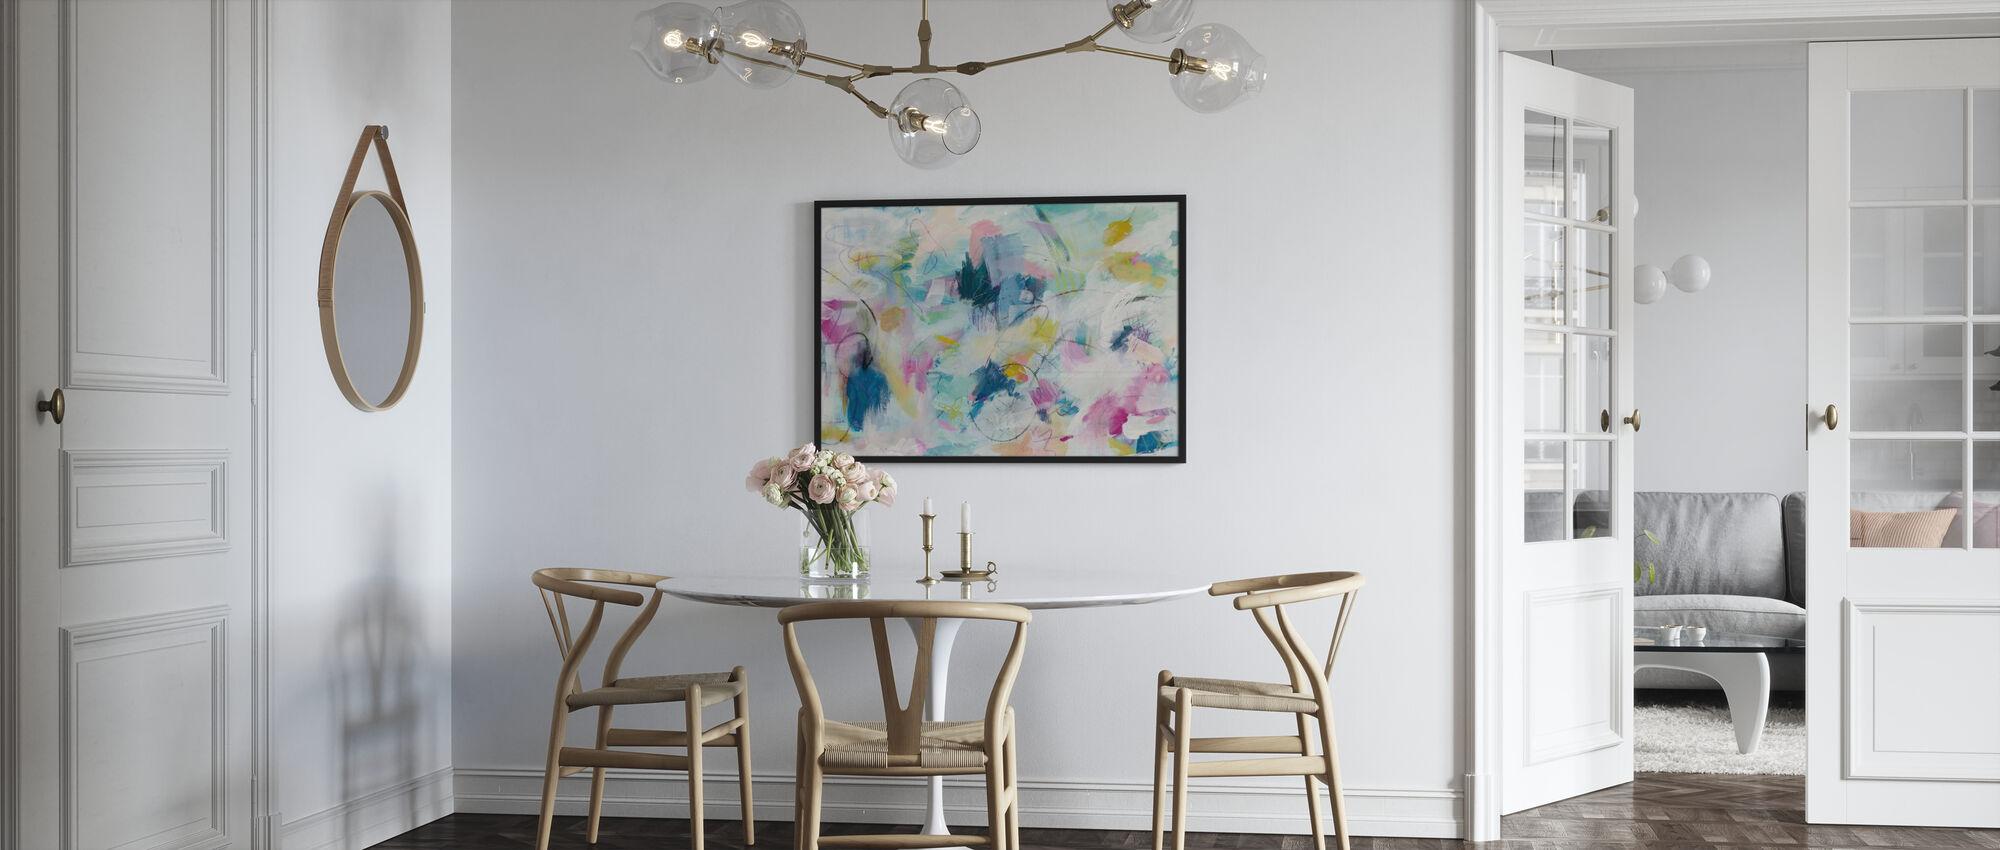 Daylight Savings III - Framed print - Kitchen